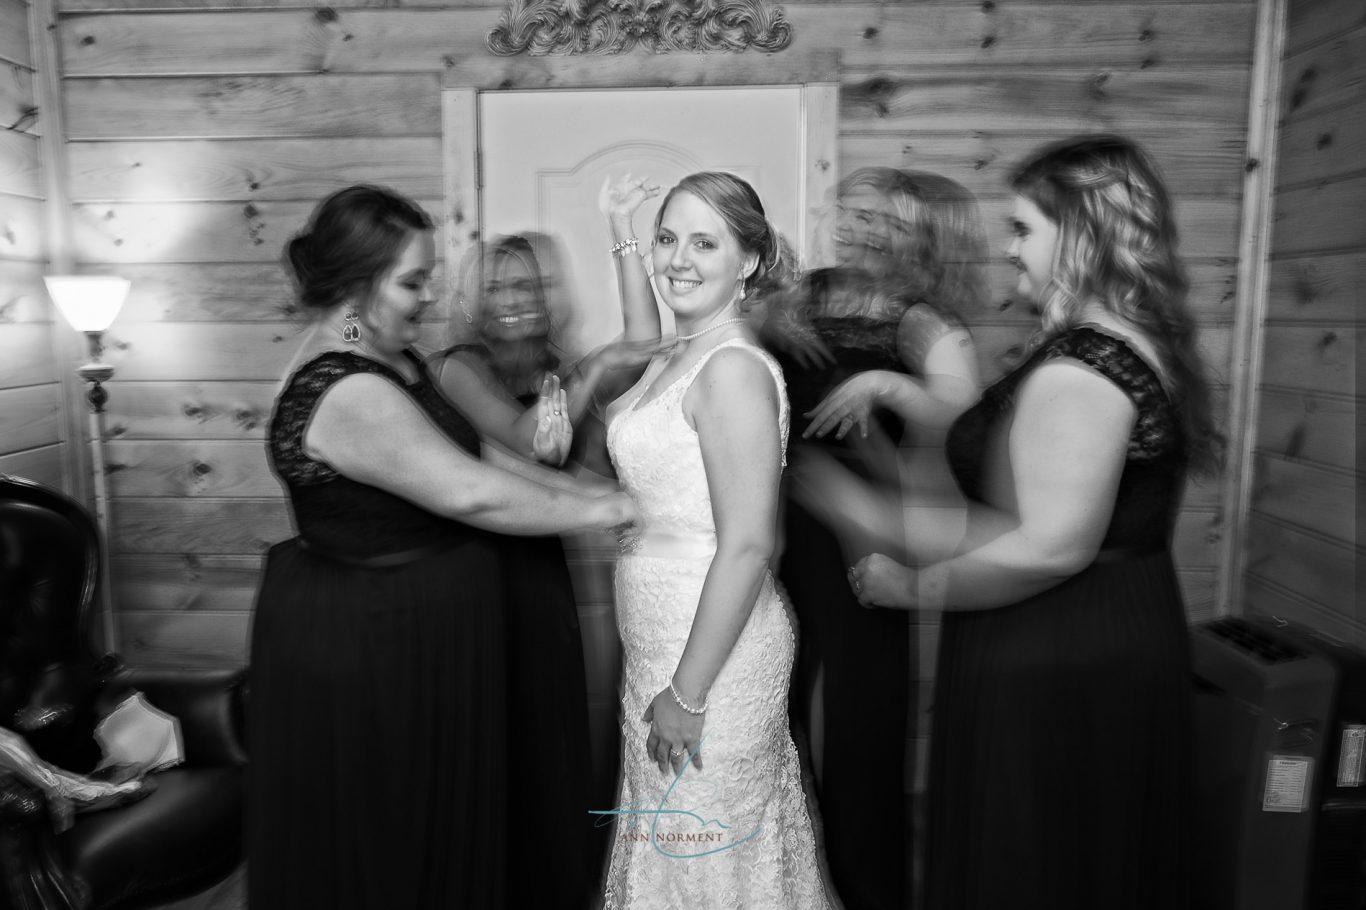 wedding photographer, charlotte nc, fort mill sc, lake wylie sc, ashville nc, hilton head sc, charleston sc, weddington nc, waxhaw nc